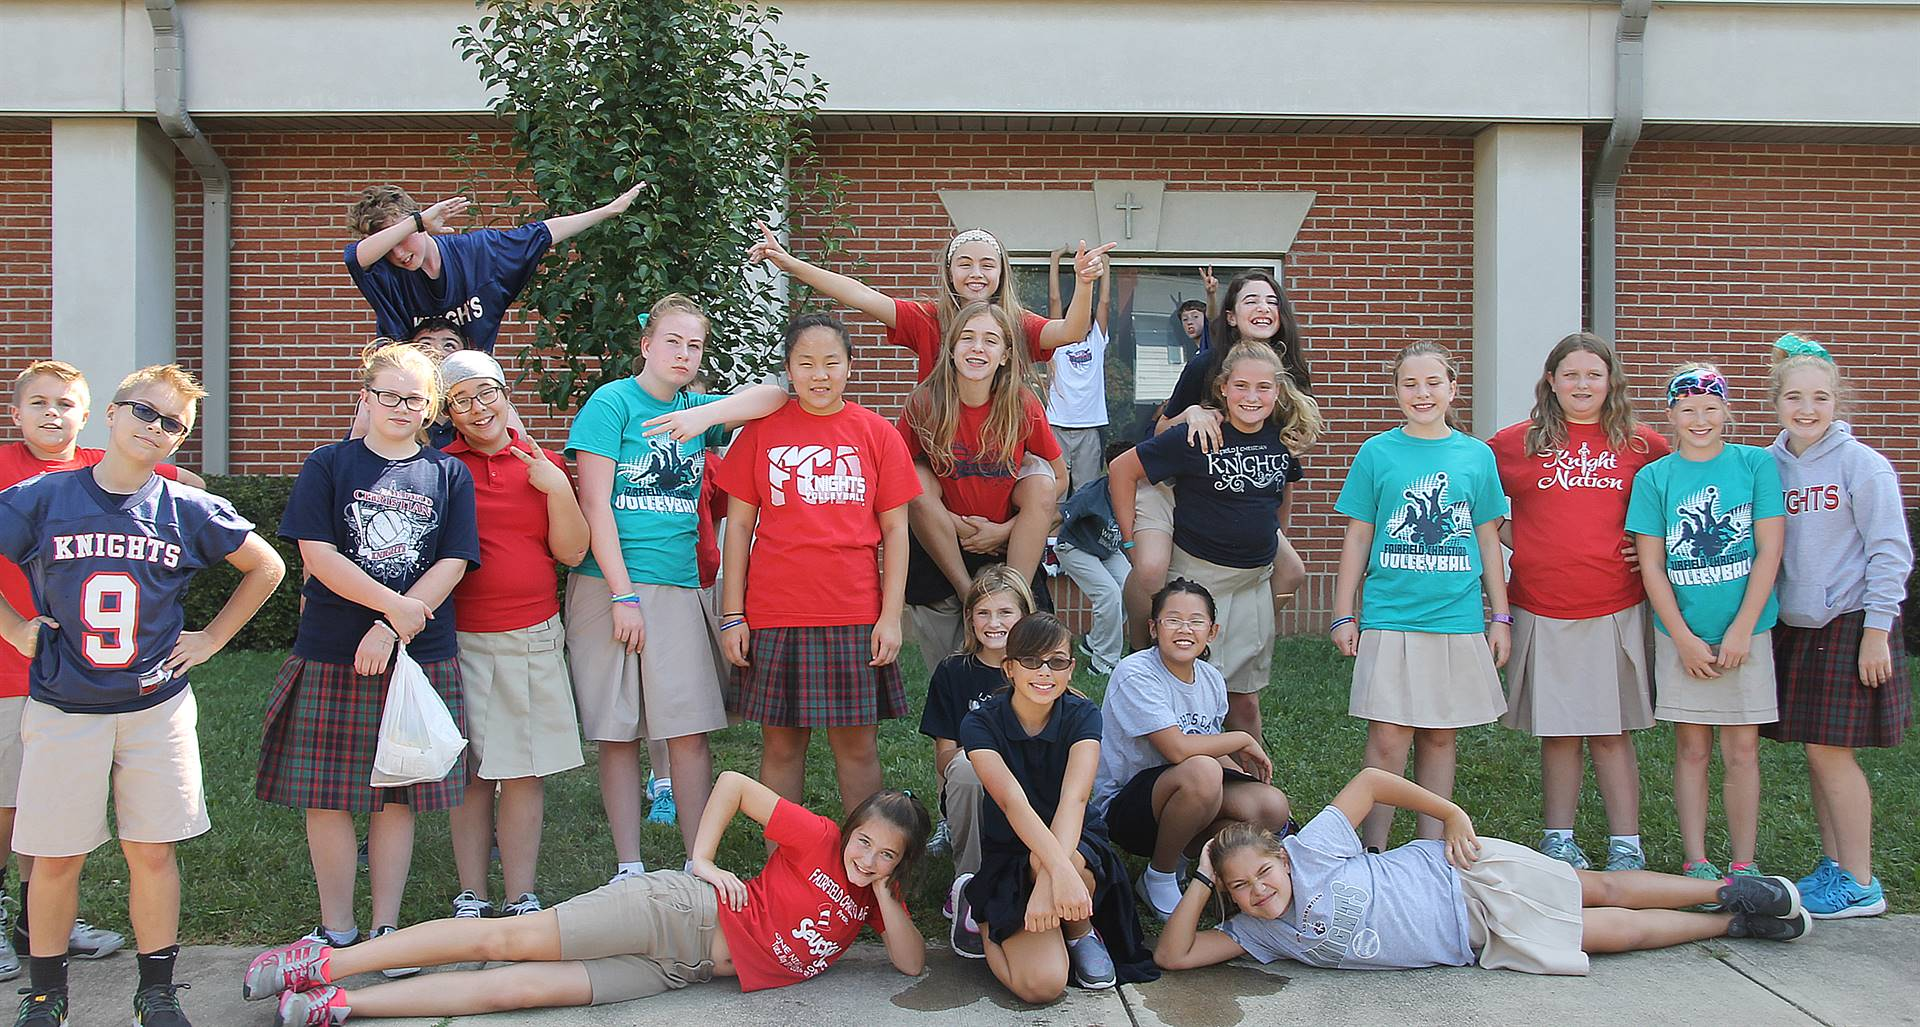 MIddle School Students Having Fun